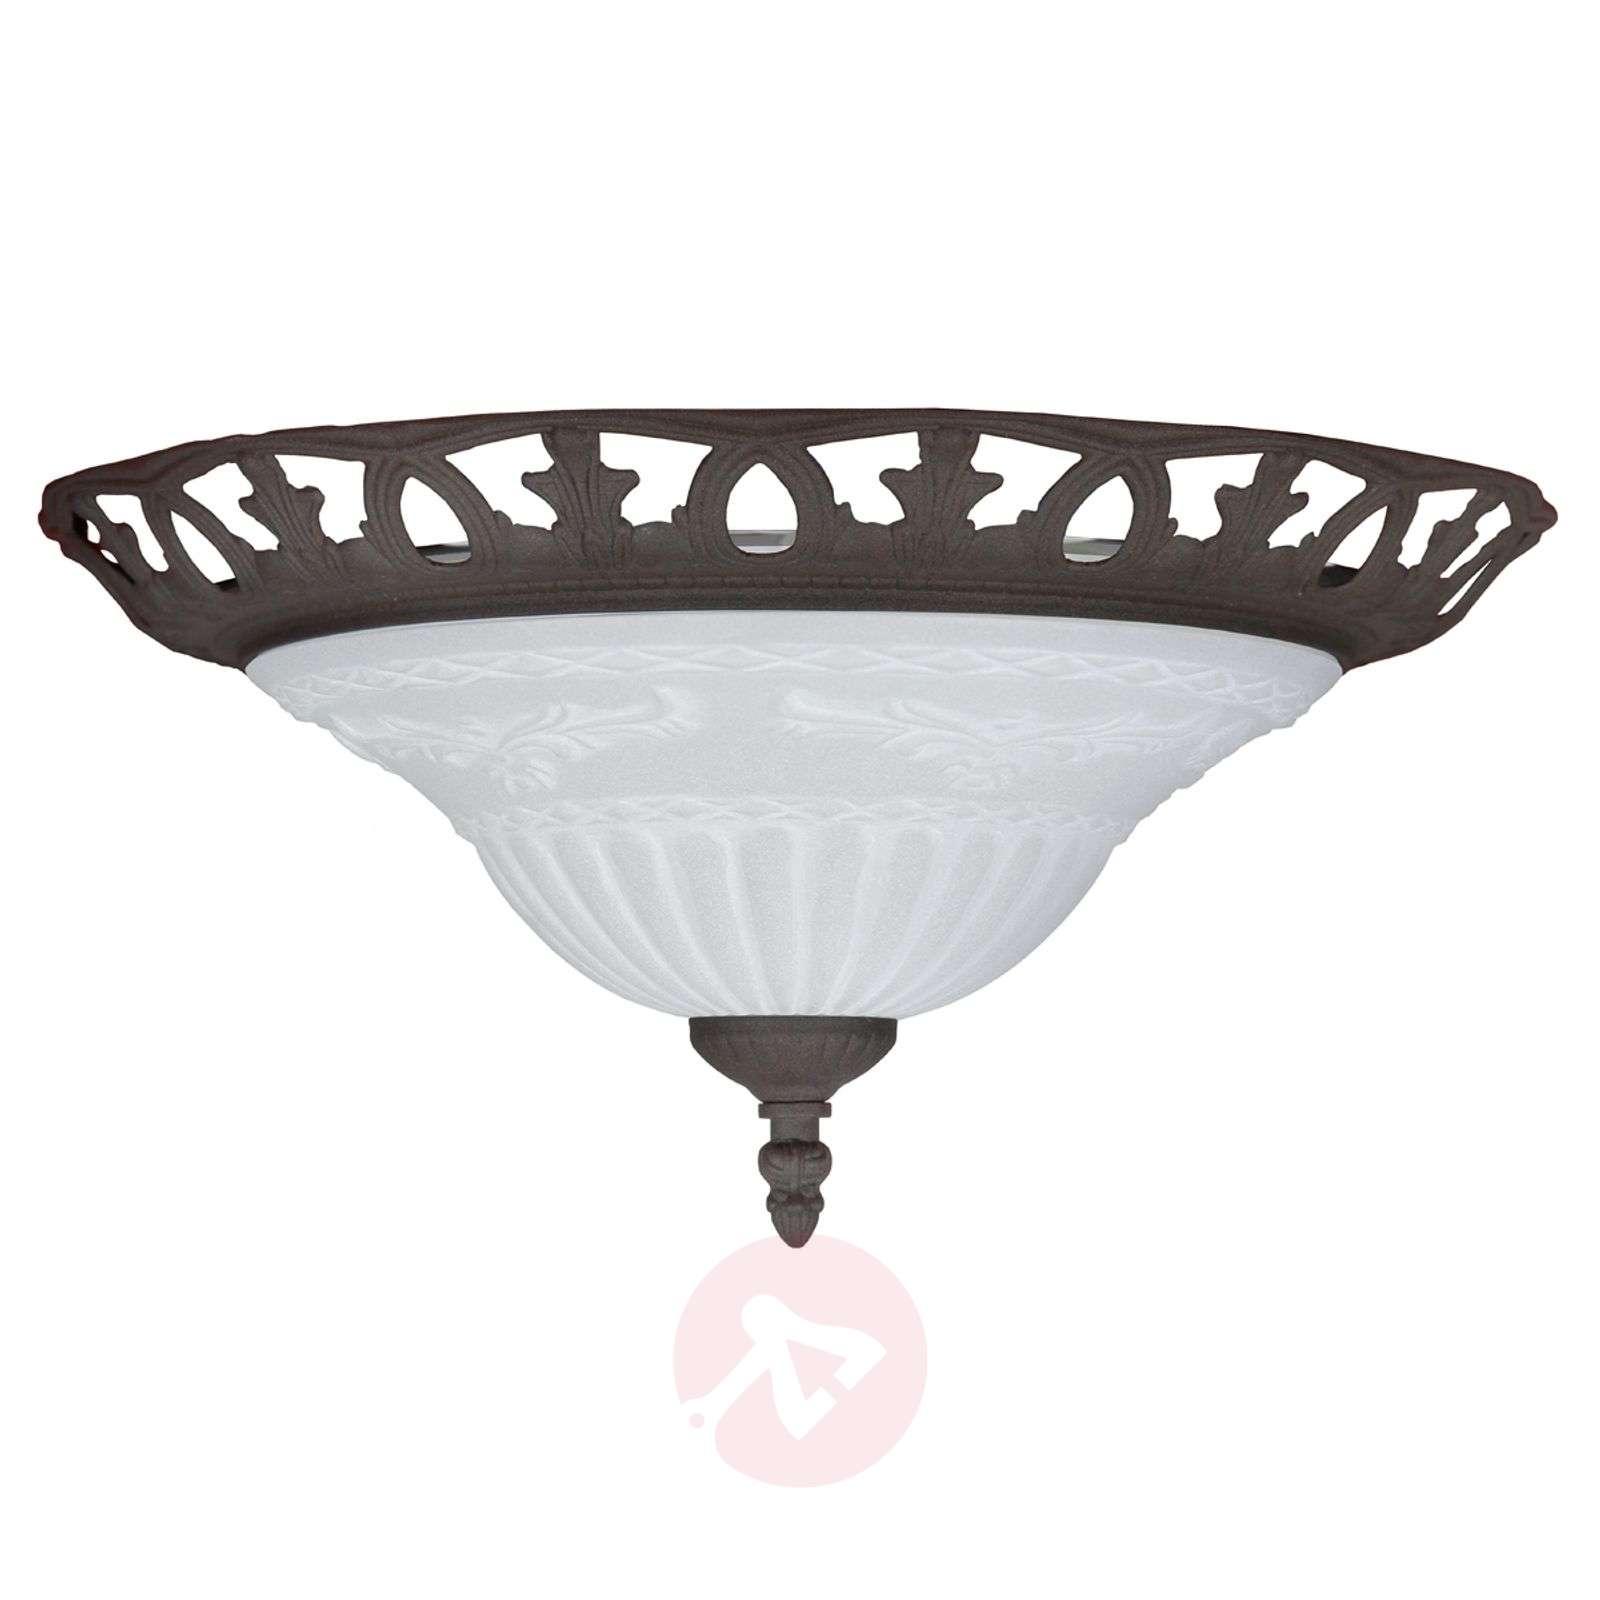 RUST ceiling light in an antique design-9003185-01